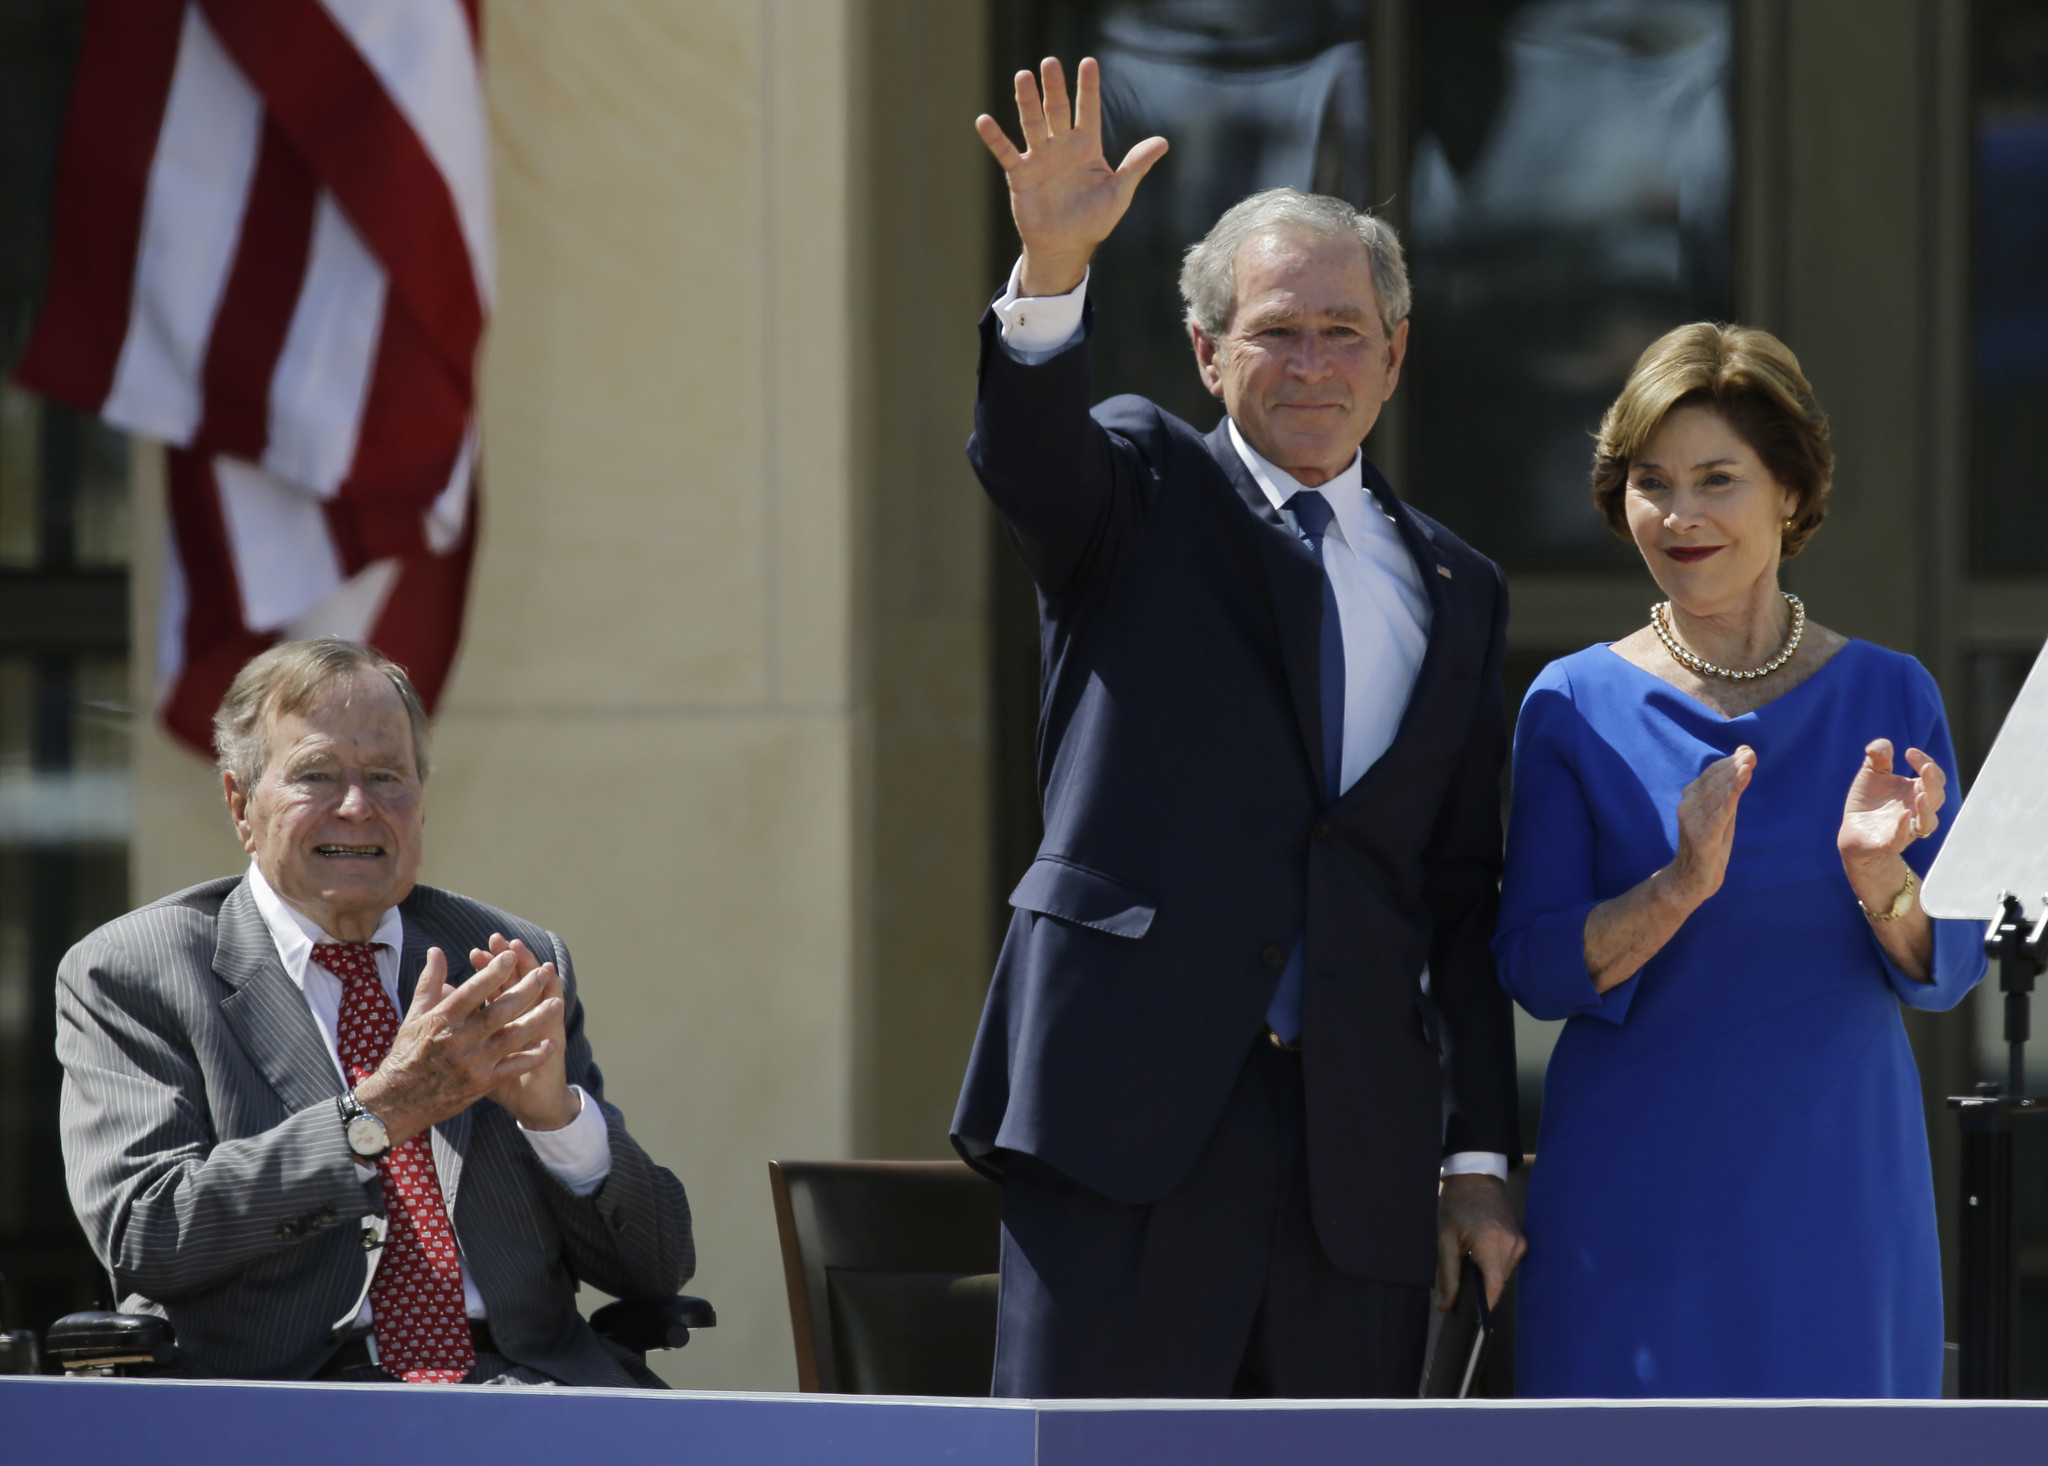 George H W Bush Criticizes Cheney And Rumsfeld For